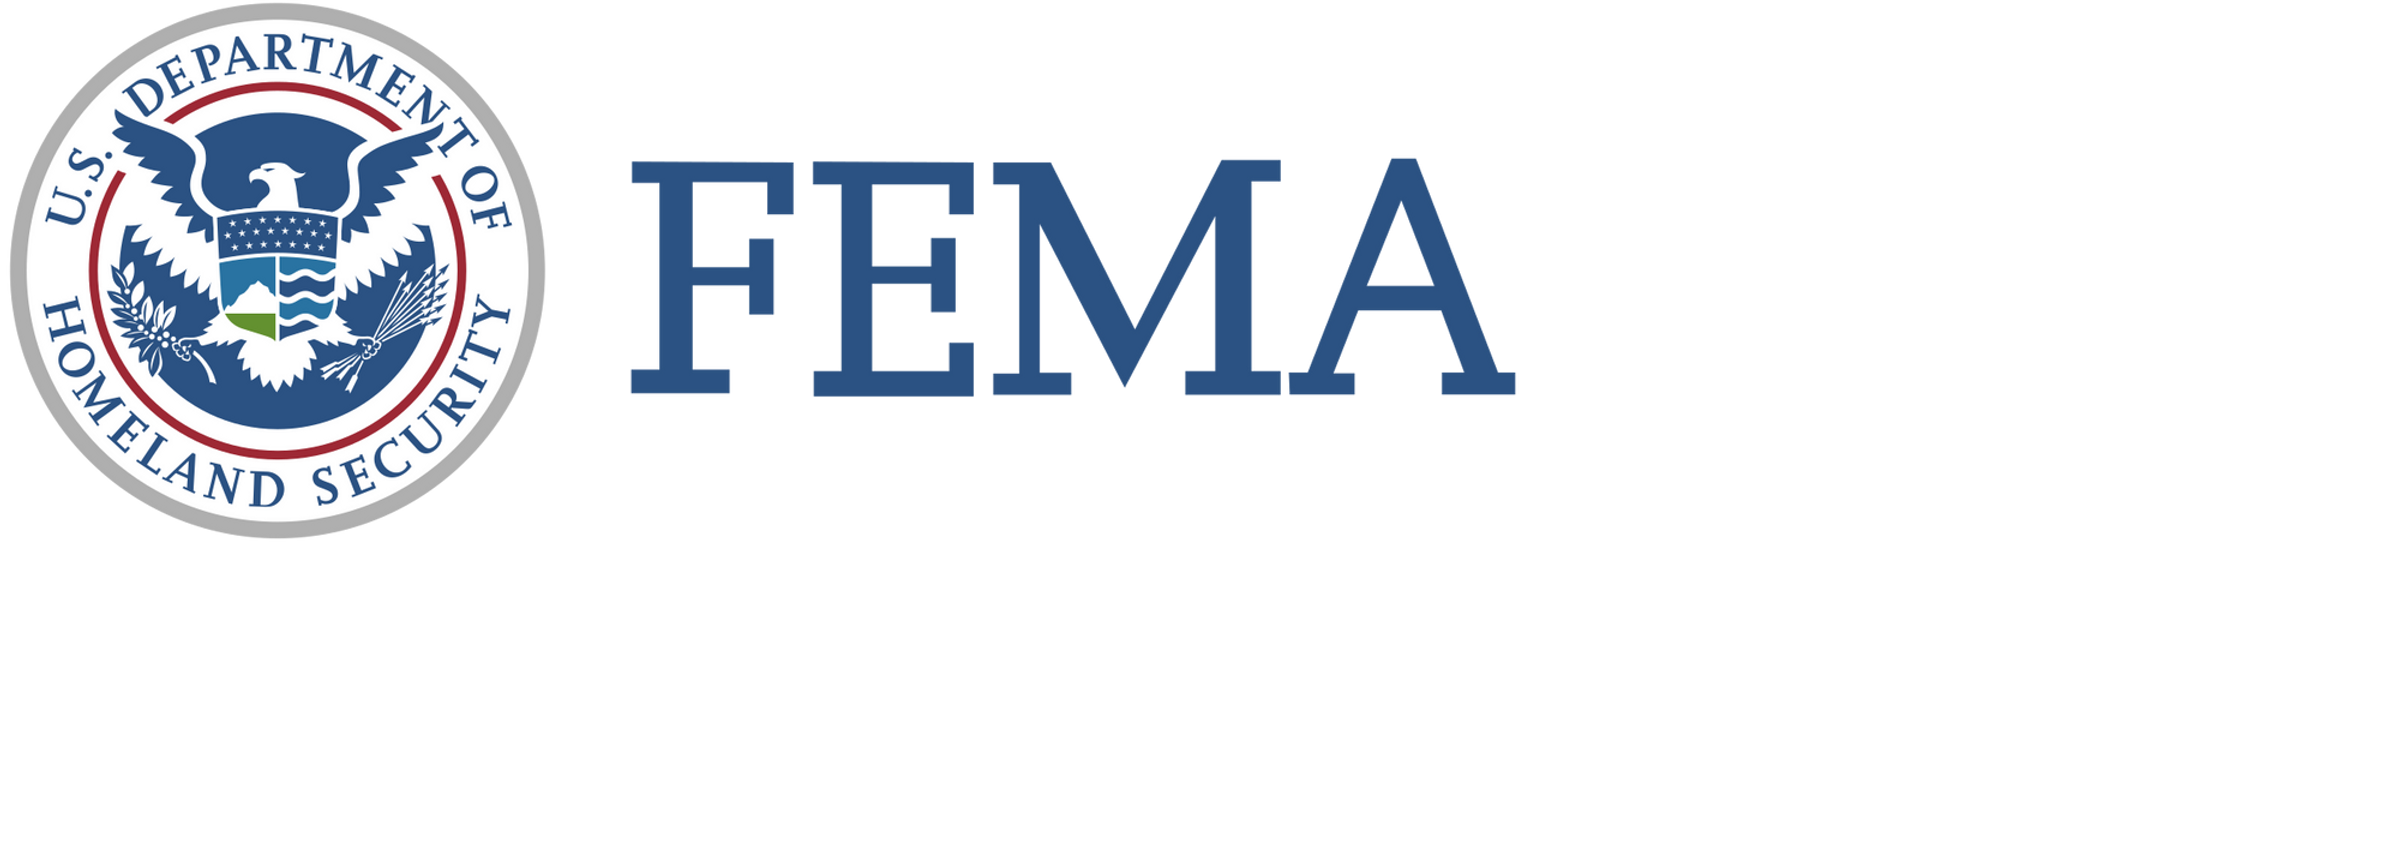 us-fema-logo-png-transparent.png